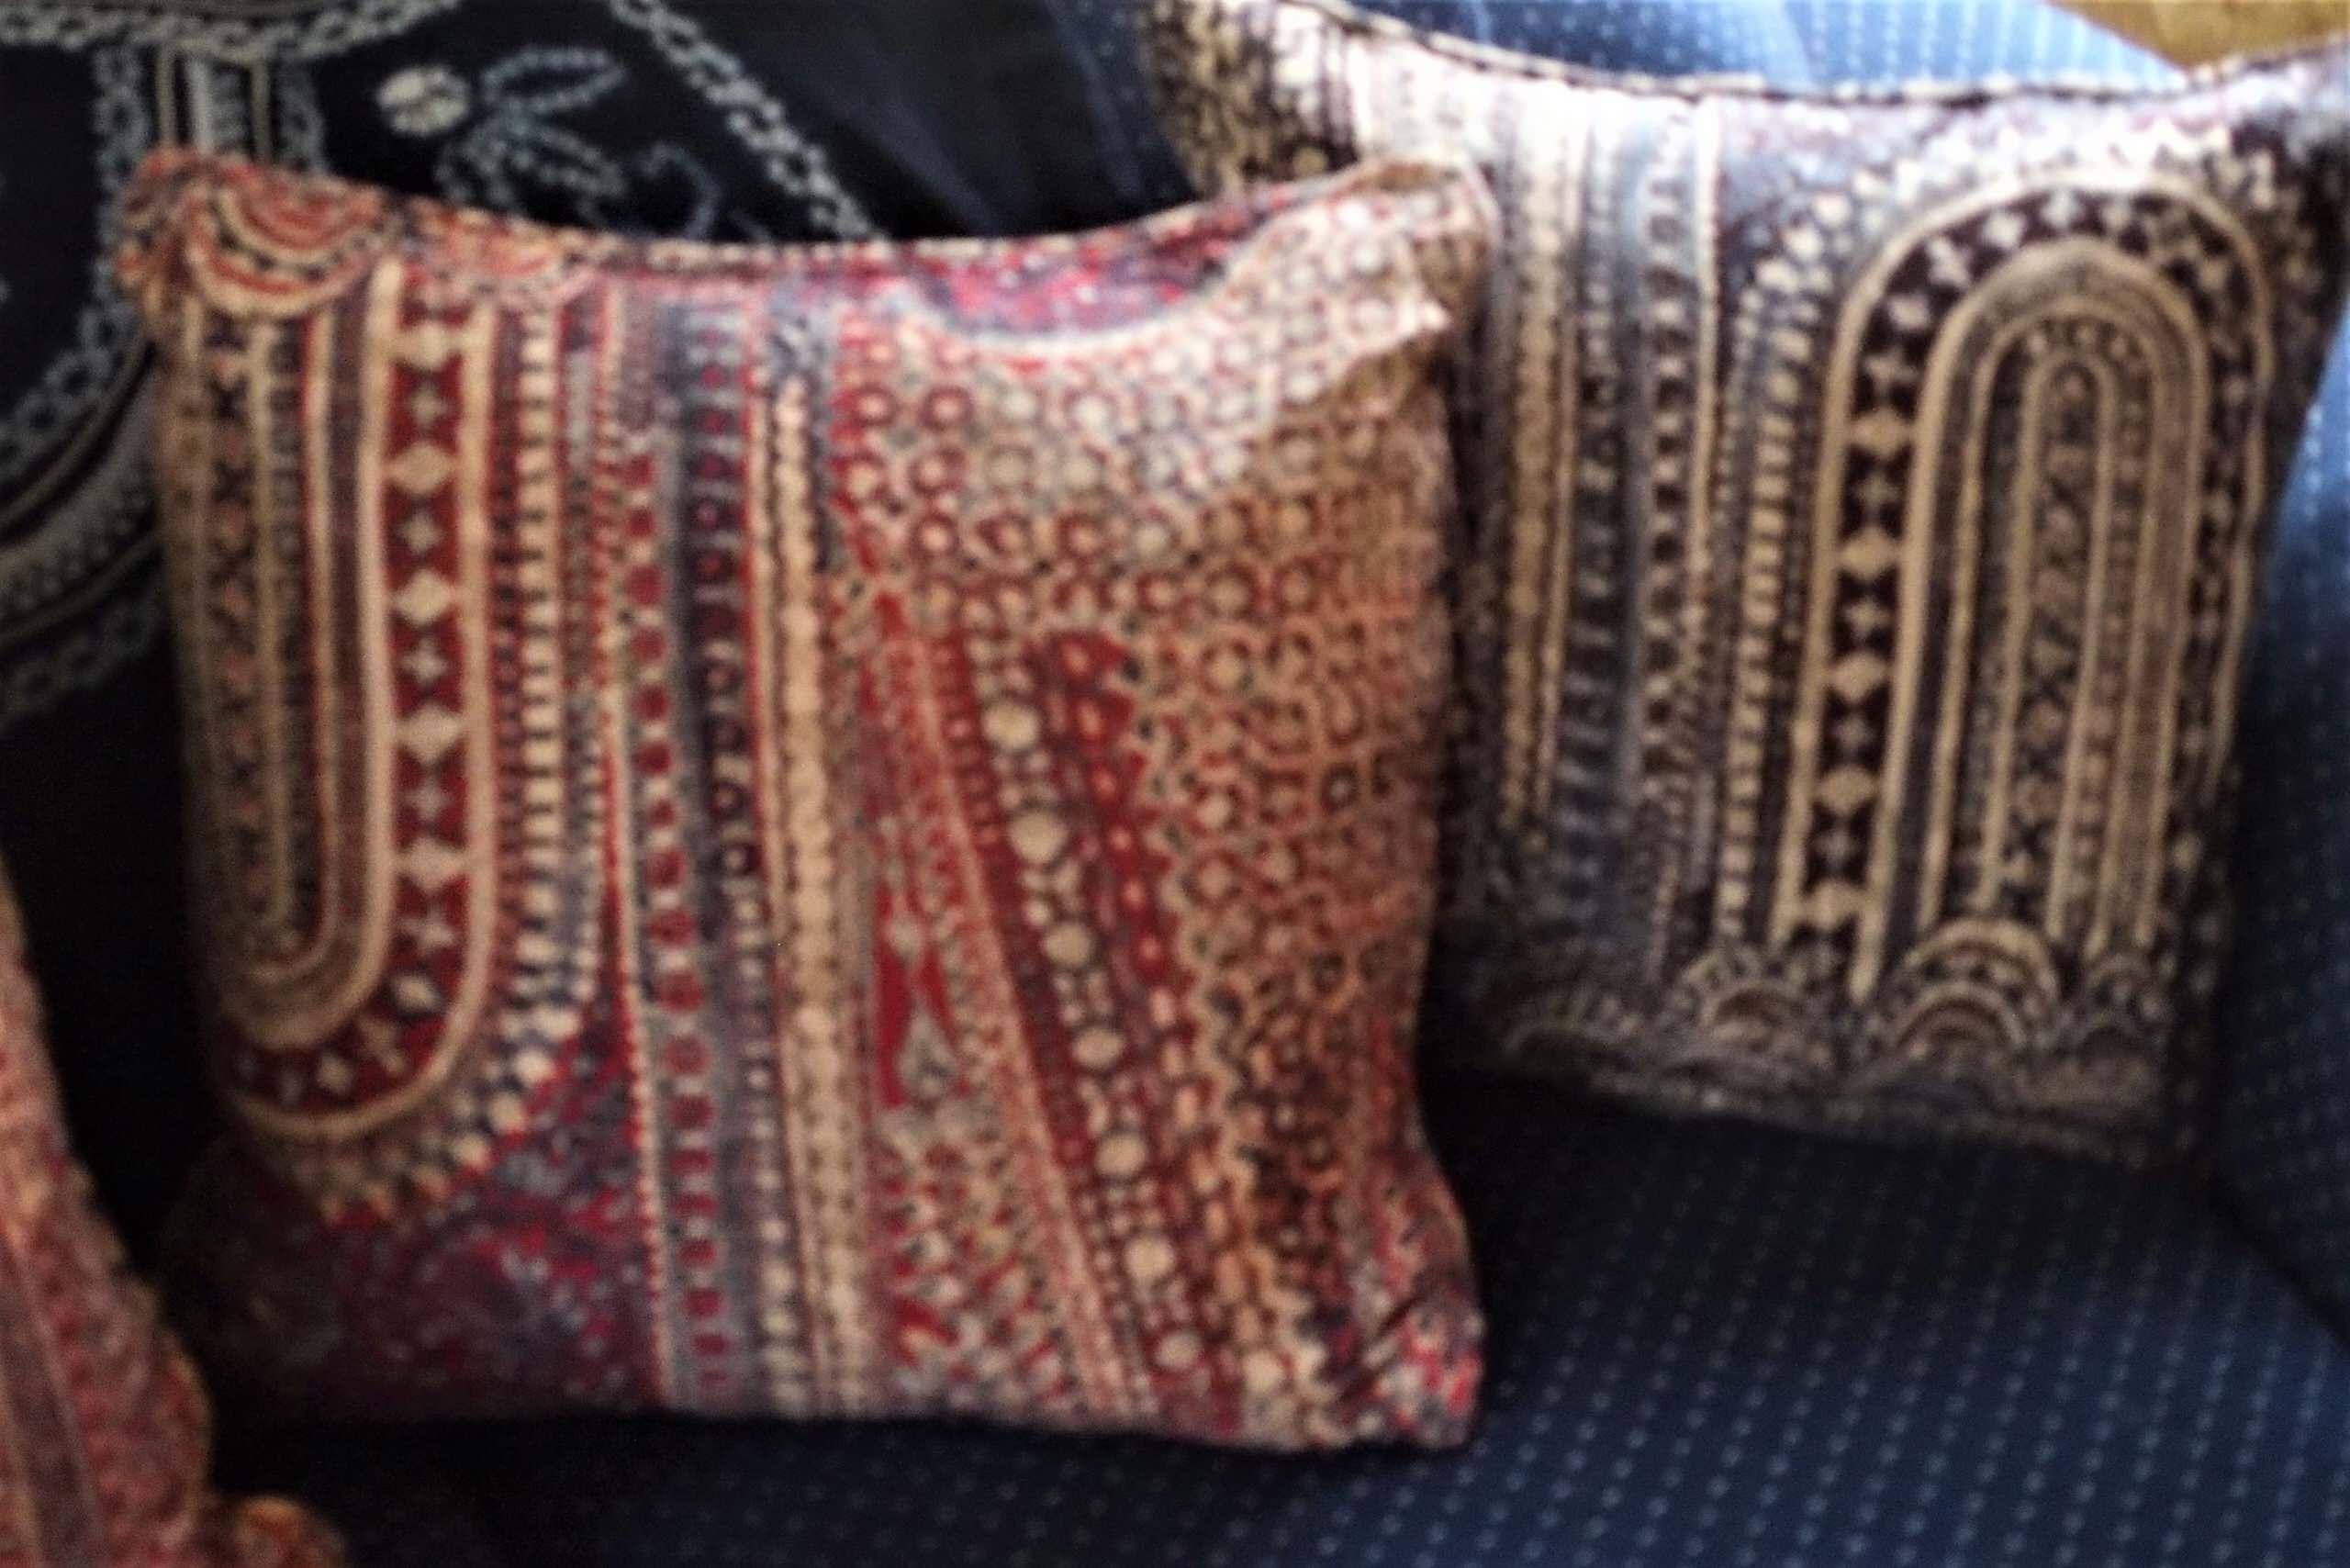 Pillowscapes